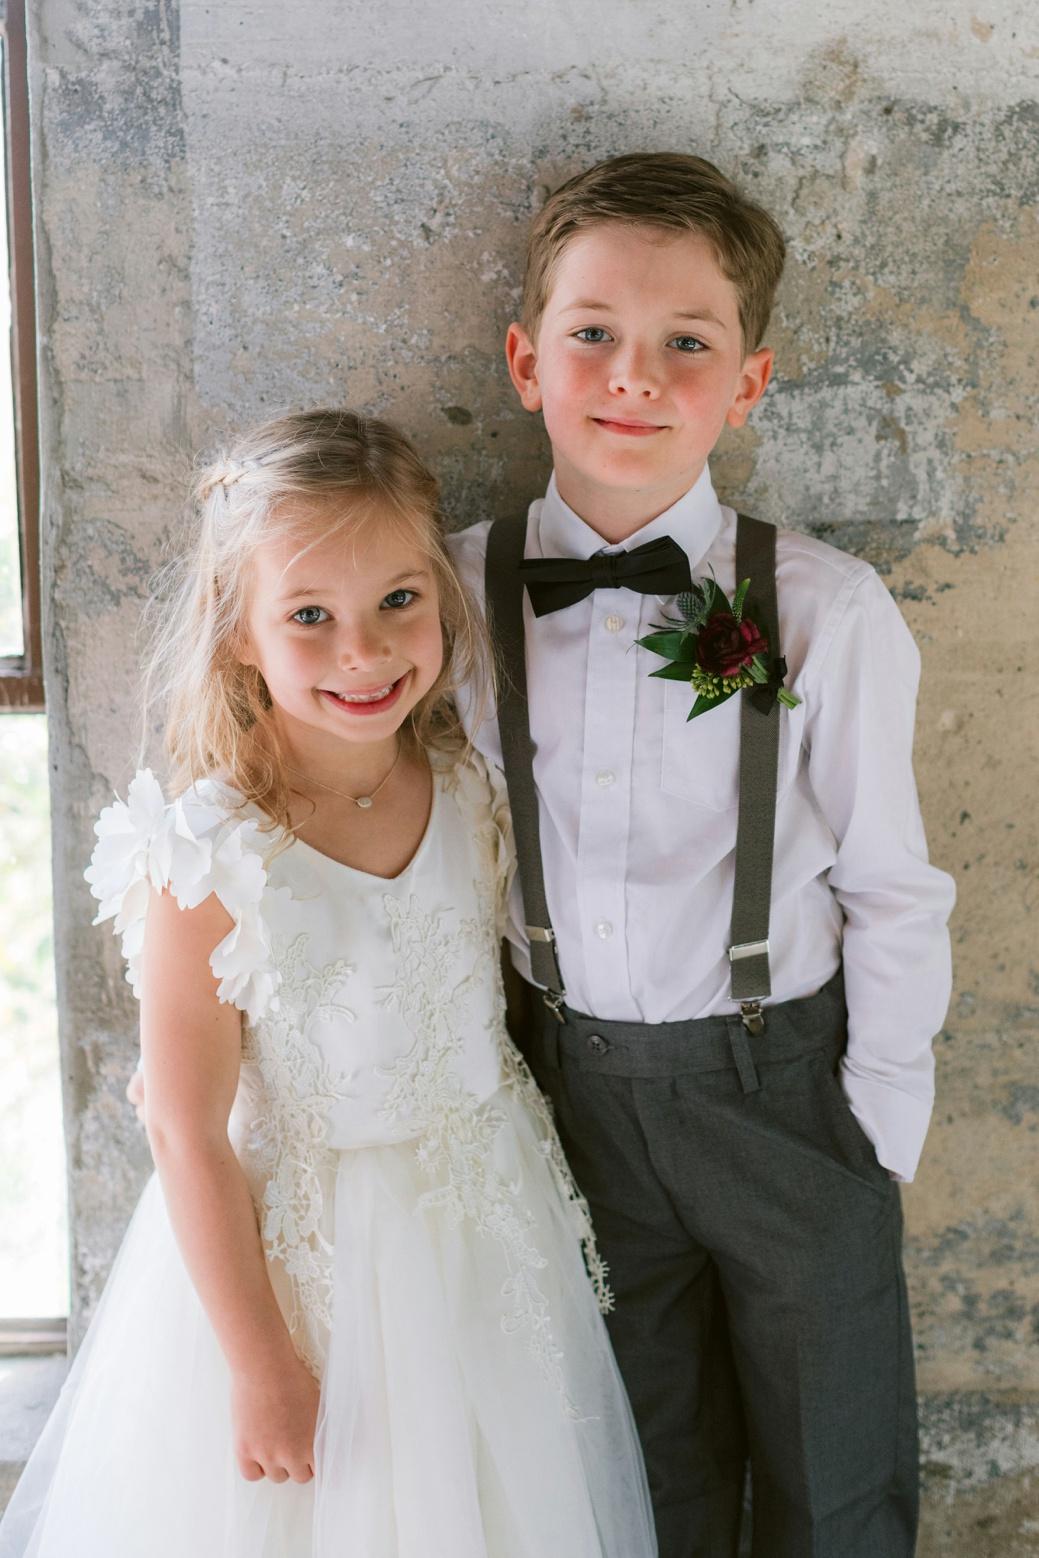 Olde-Dobbin-Station-Wedding-Photographer-Kelly-25